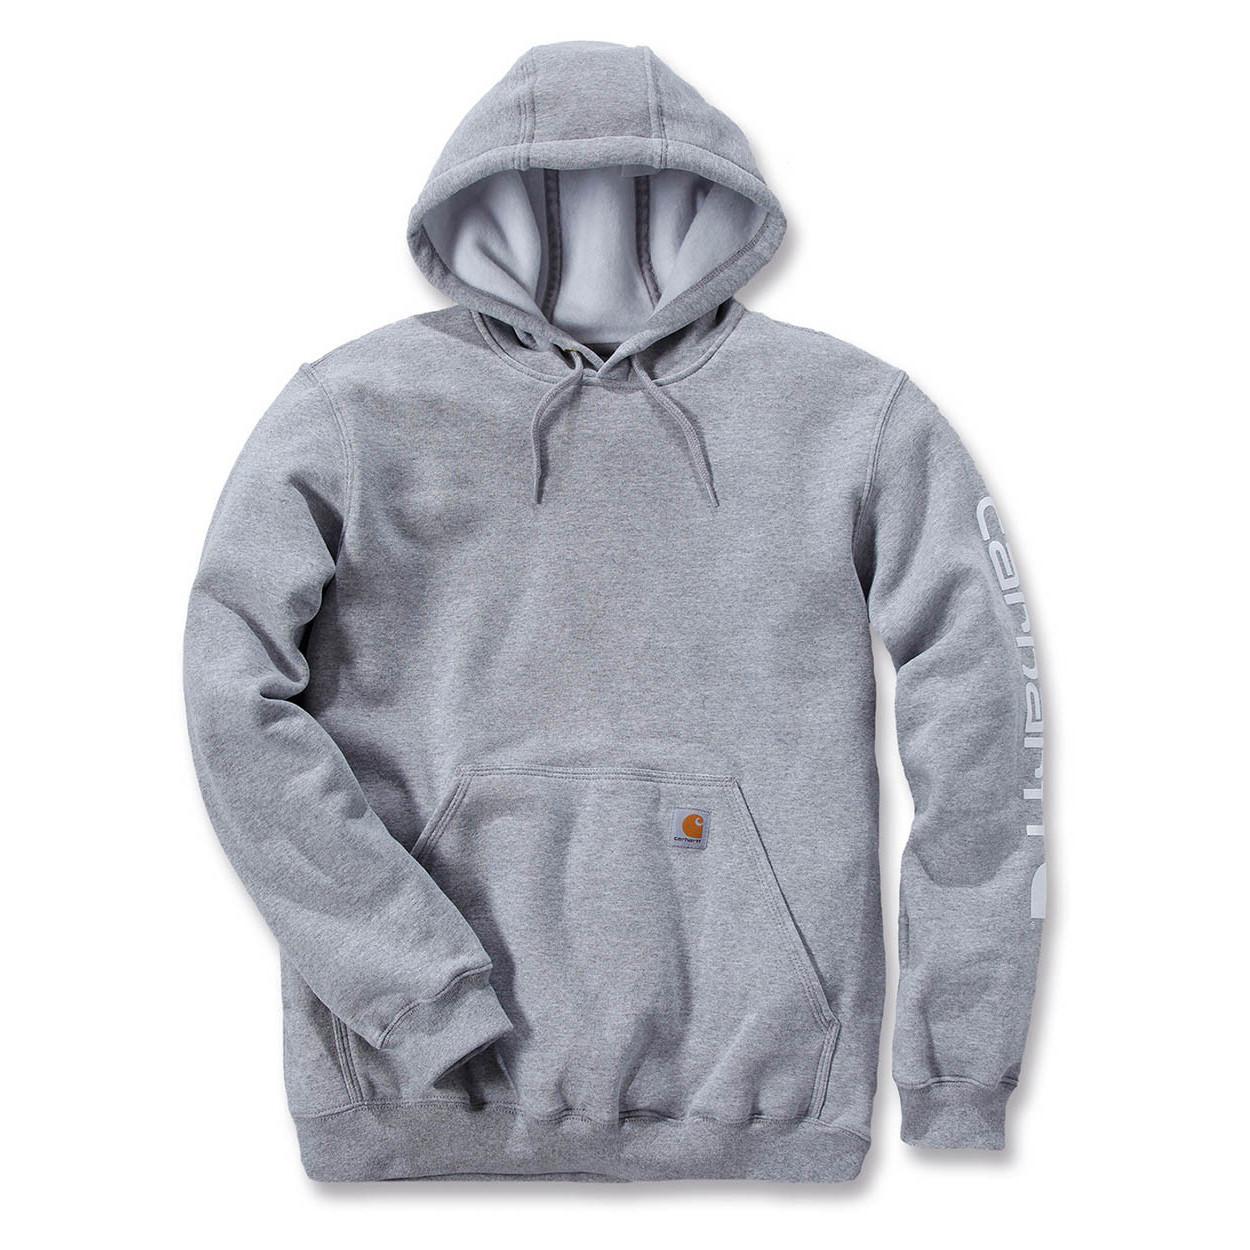 Худи Carhartt Sleeve Logo Hooded Sweatshirt - K288 (Heather Grey, S)